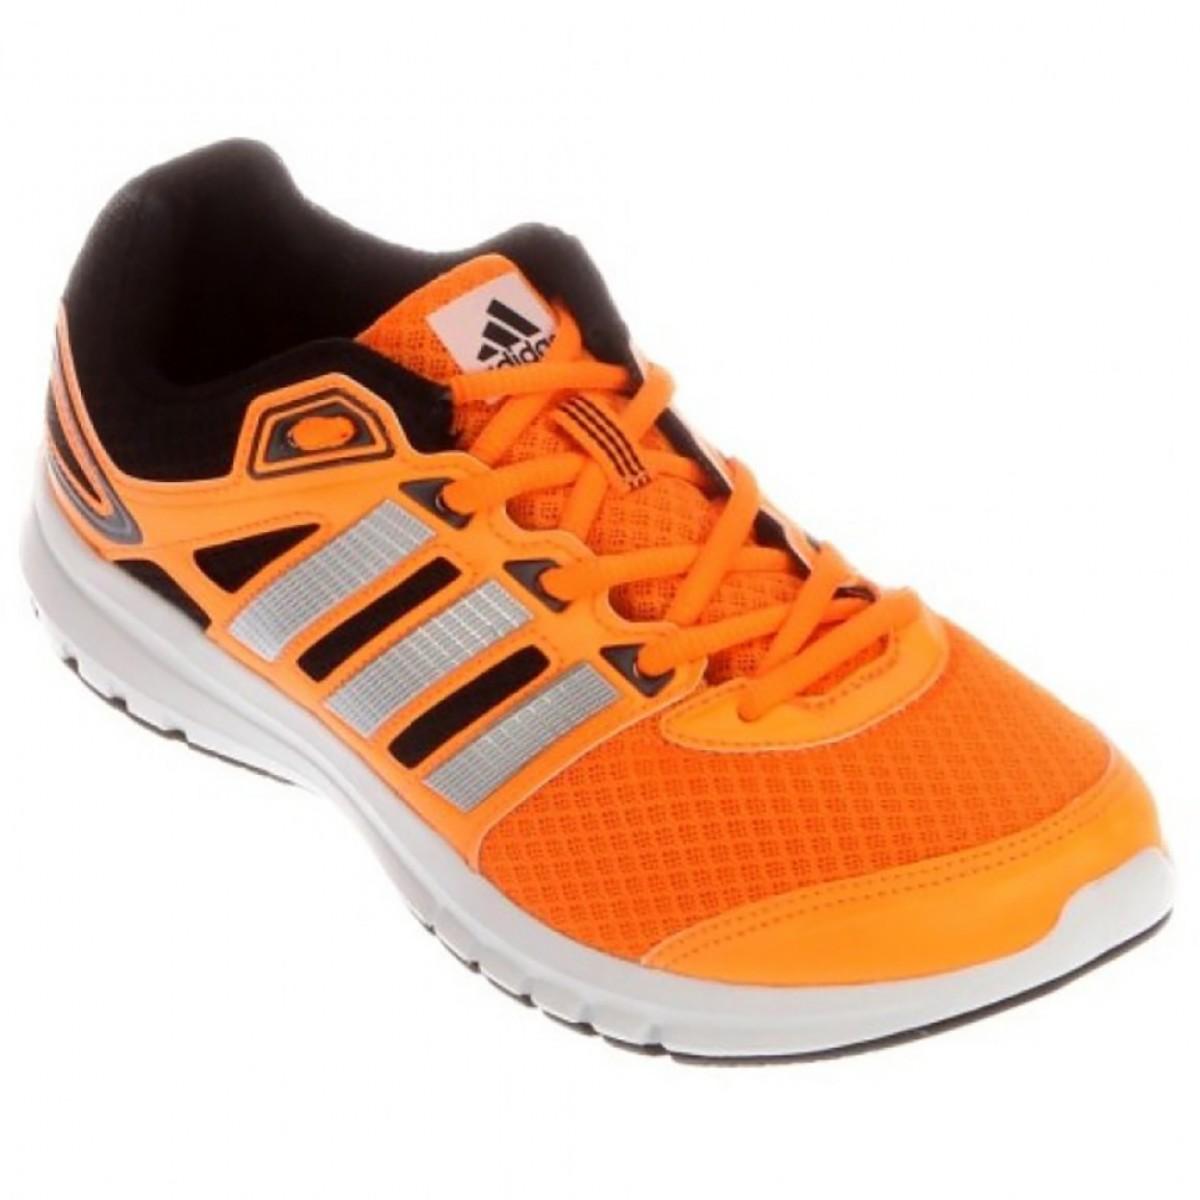 1b99da2d55 Tênis Masculino Adidas Duramo 6 Laranja - Compre Agora